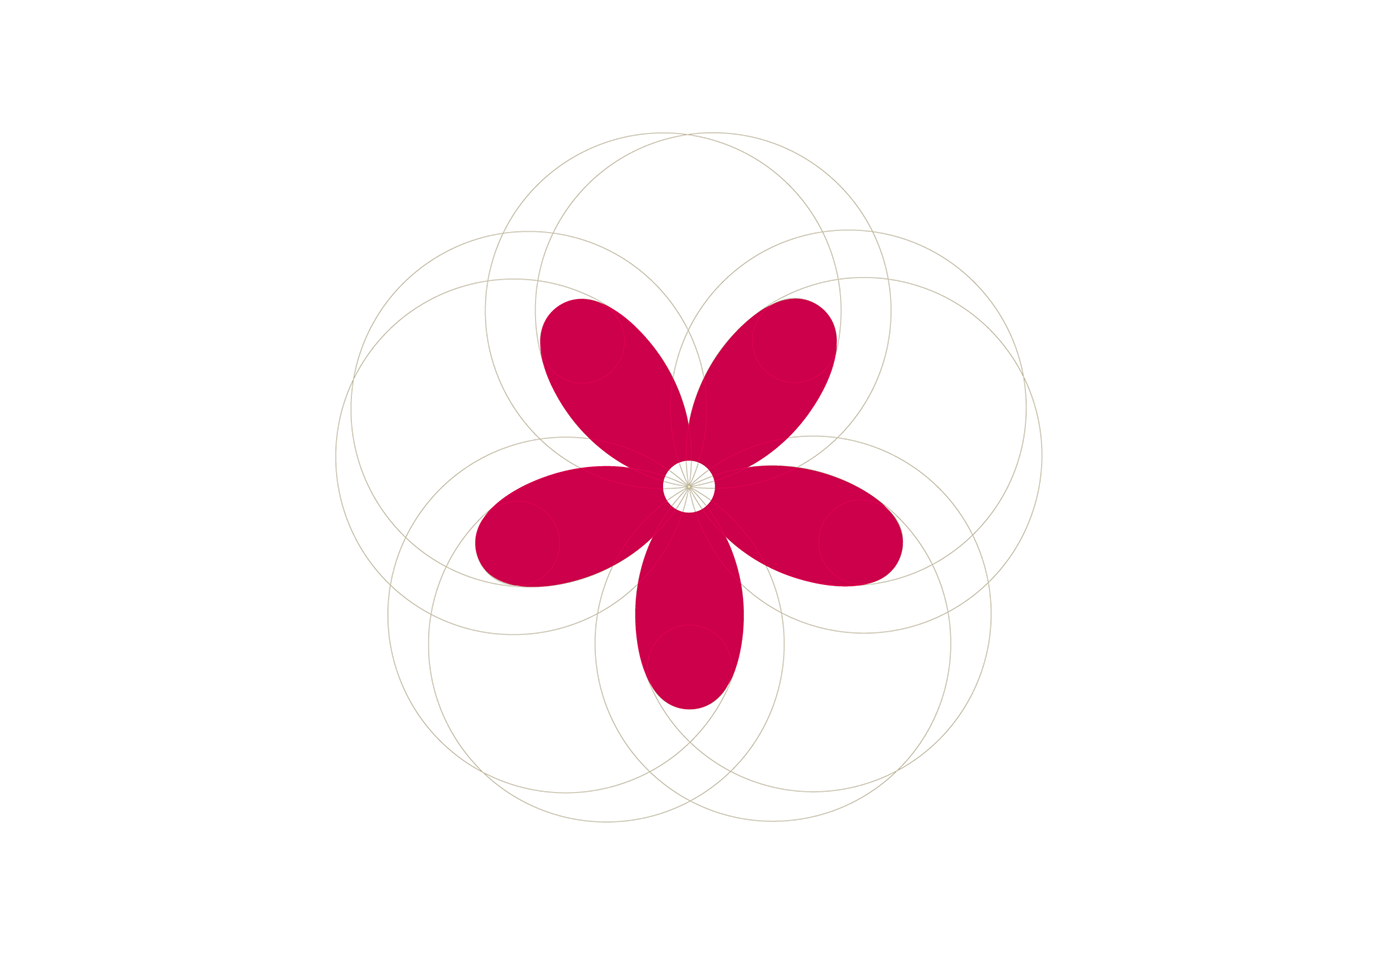 logo fashion logo Golden Ratio golden ratio in 1.618 fibonacci number geomatric logo scaled logo awesome Logo presentation brand logo geomatry in logo perfect scaled calligraphy logo elegant